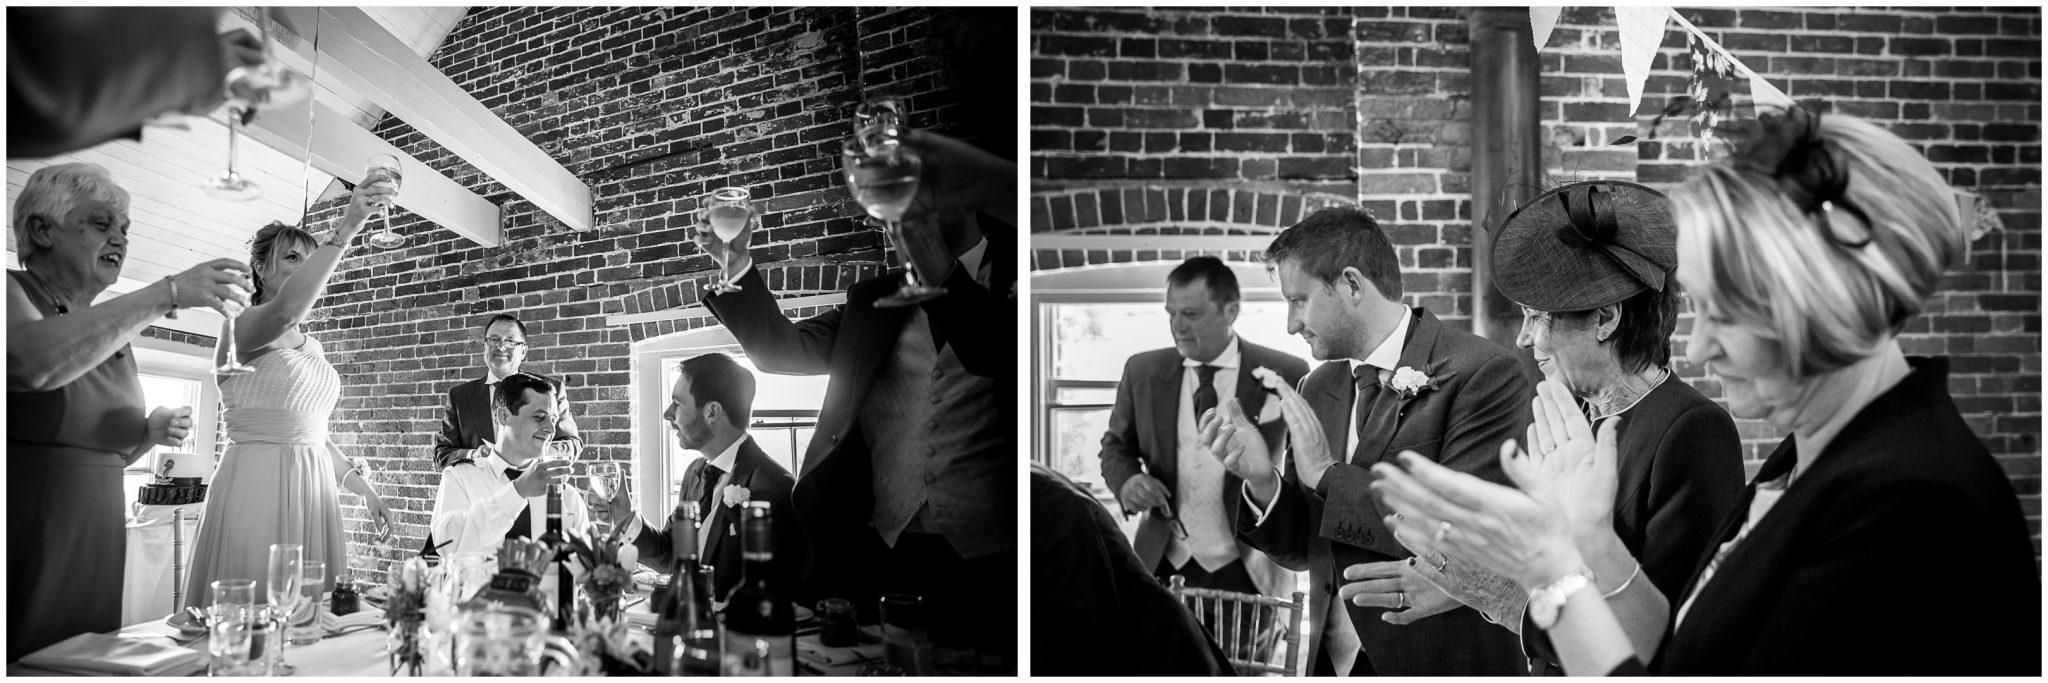 Sopley wedding photographer toasting the couple